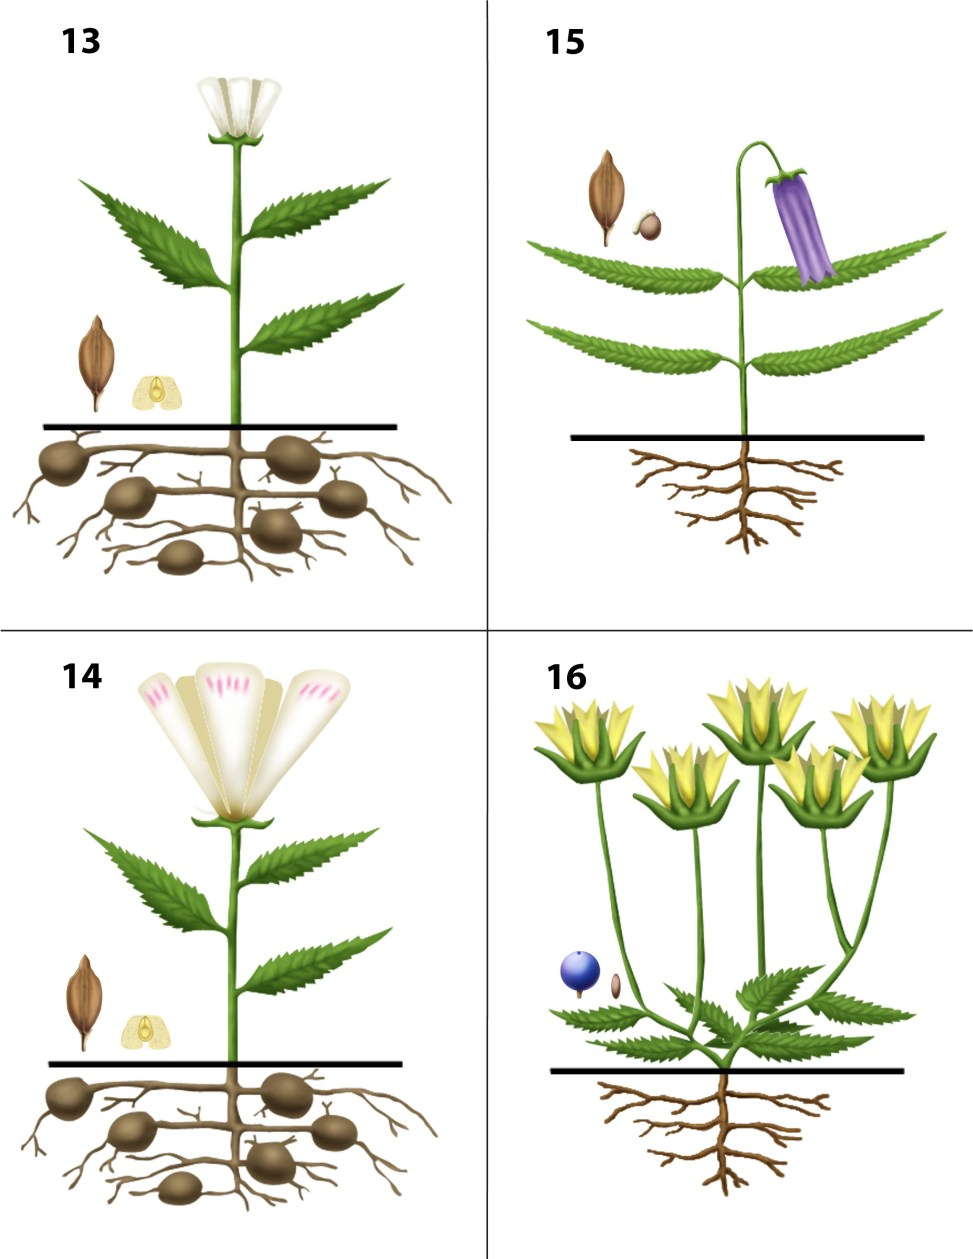 Dendrogrammaceae 13-16